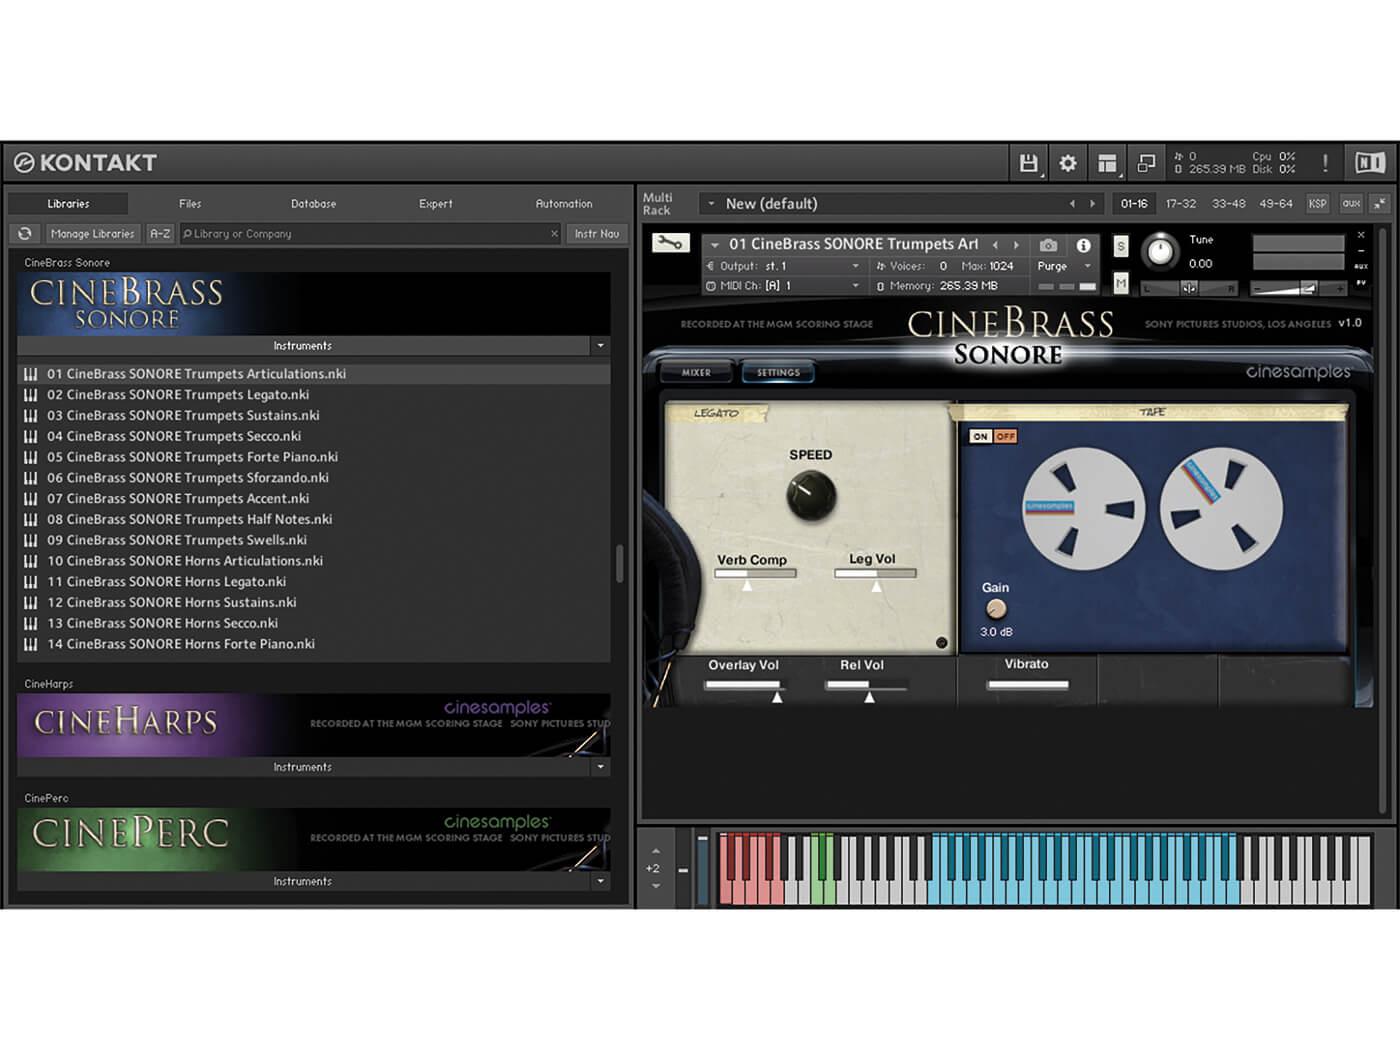 CineBrass Sonore GUI 2